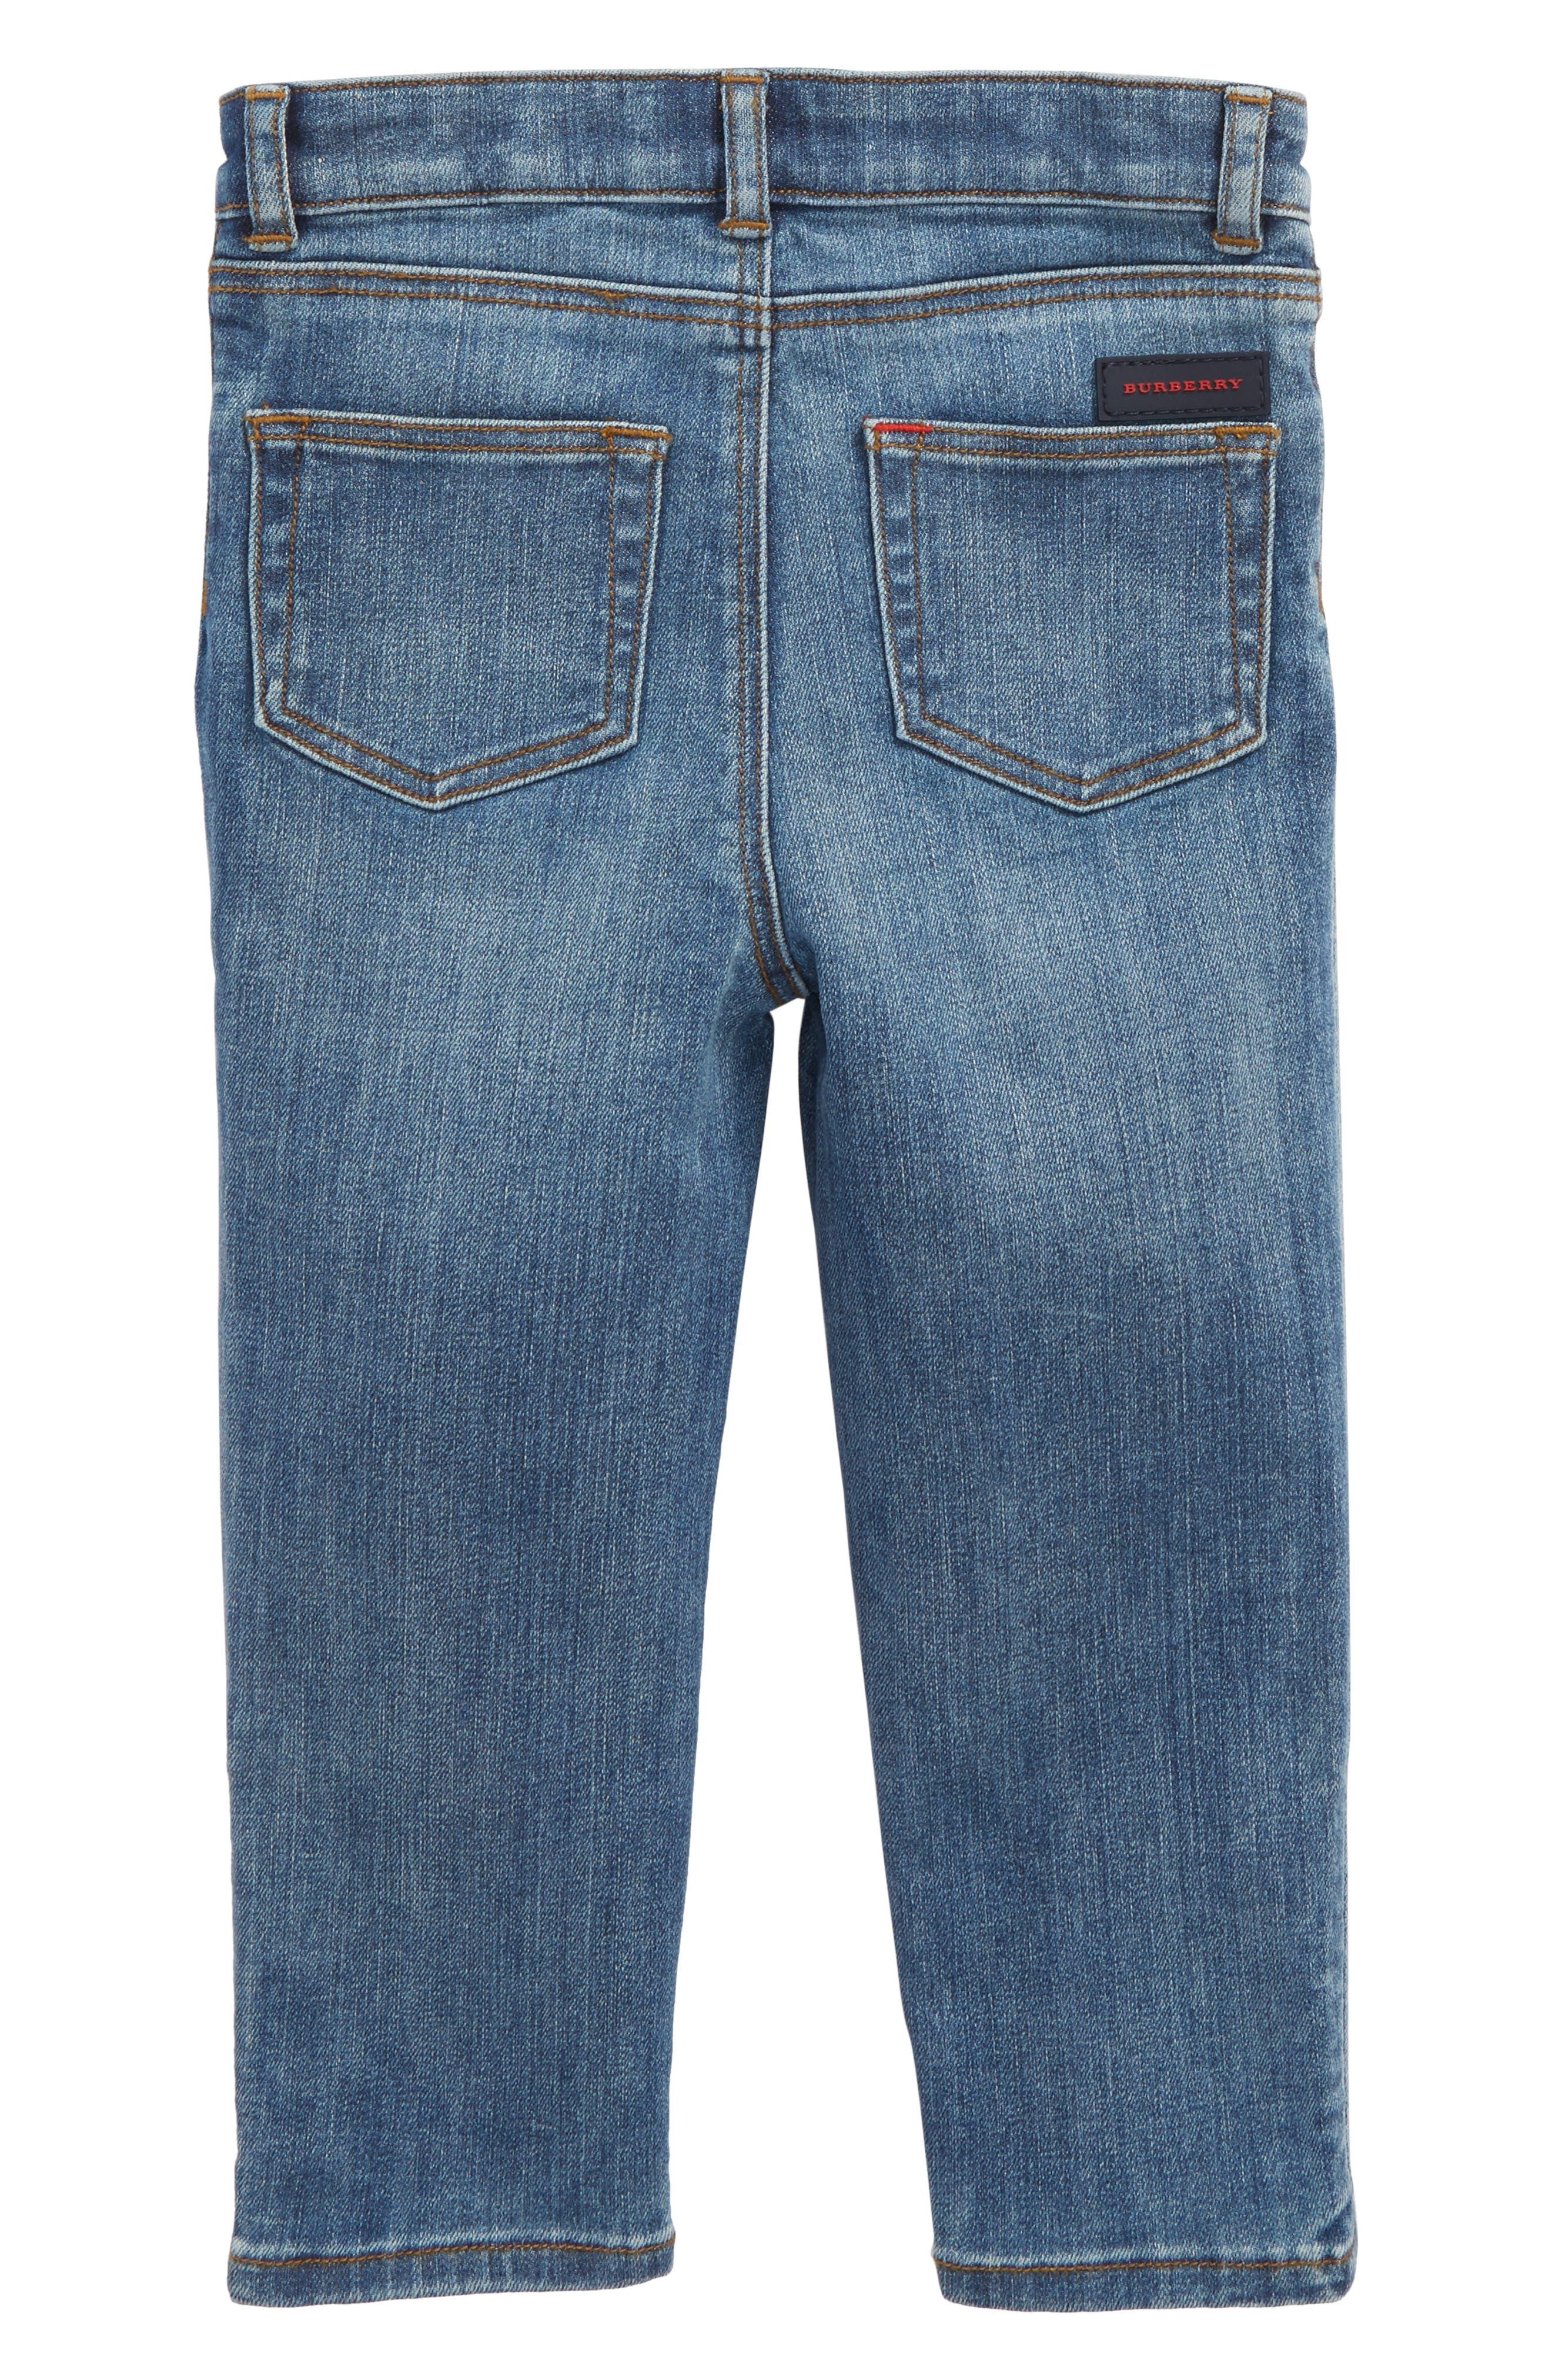 Skinny Jeans,                             Alternate thumbnail 2, color,                             412